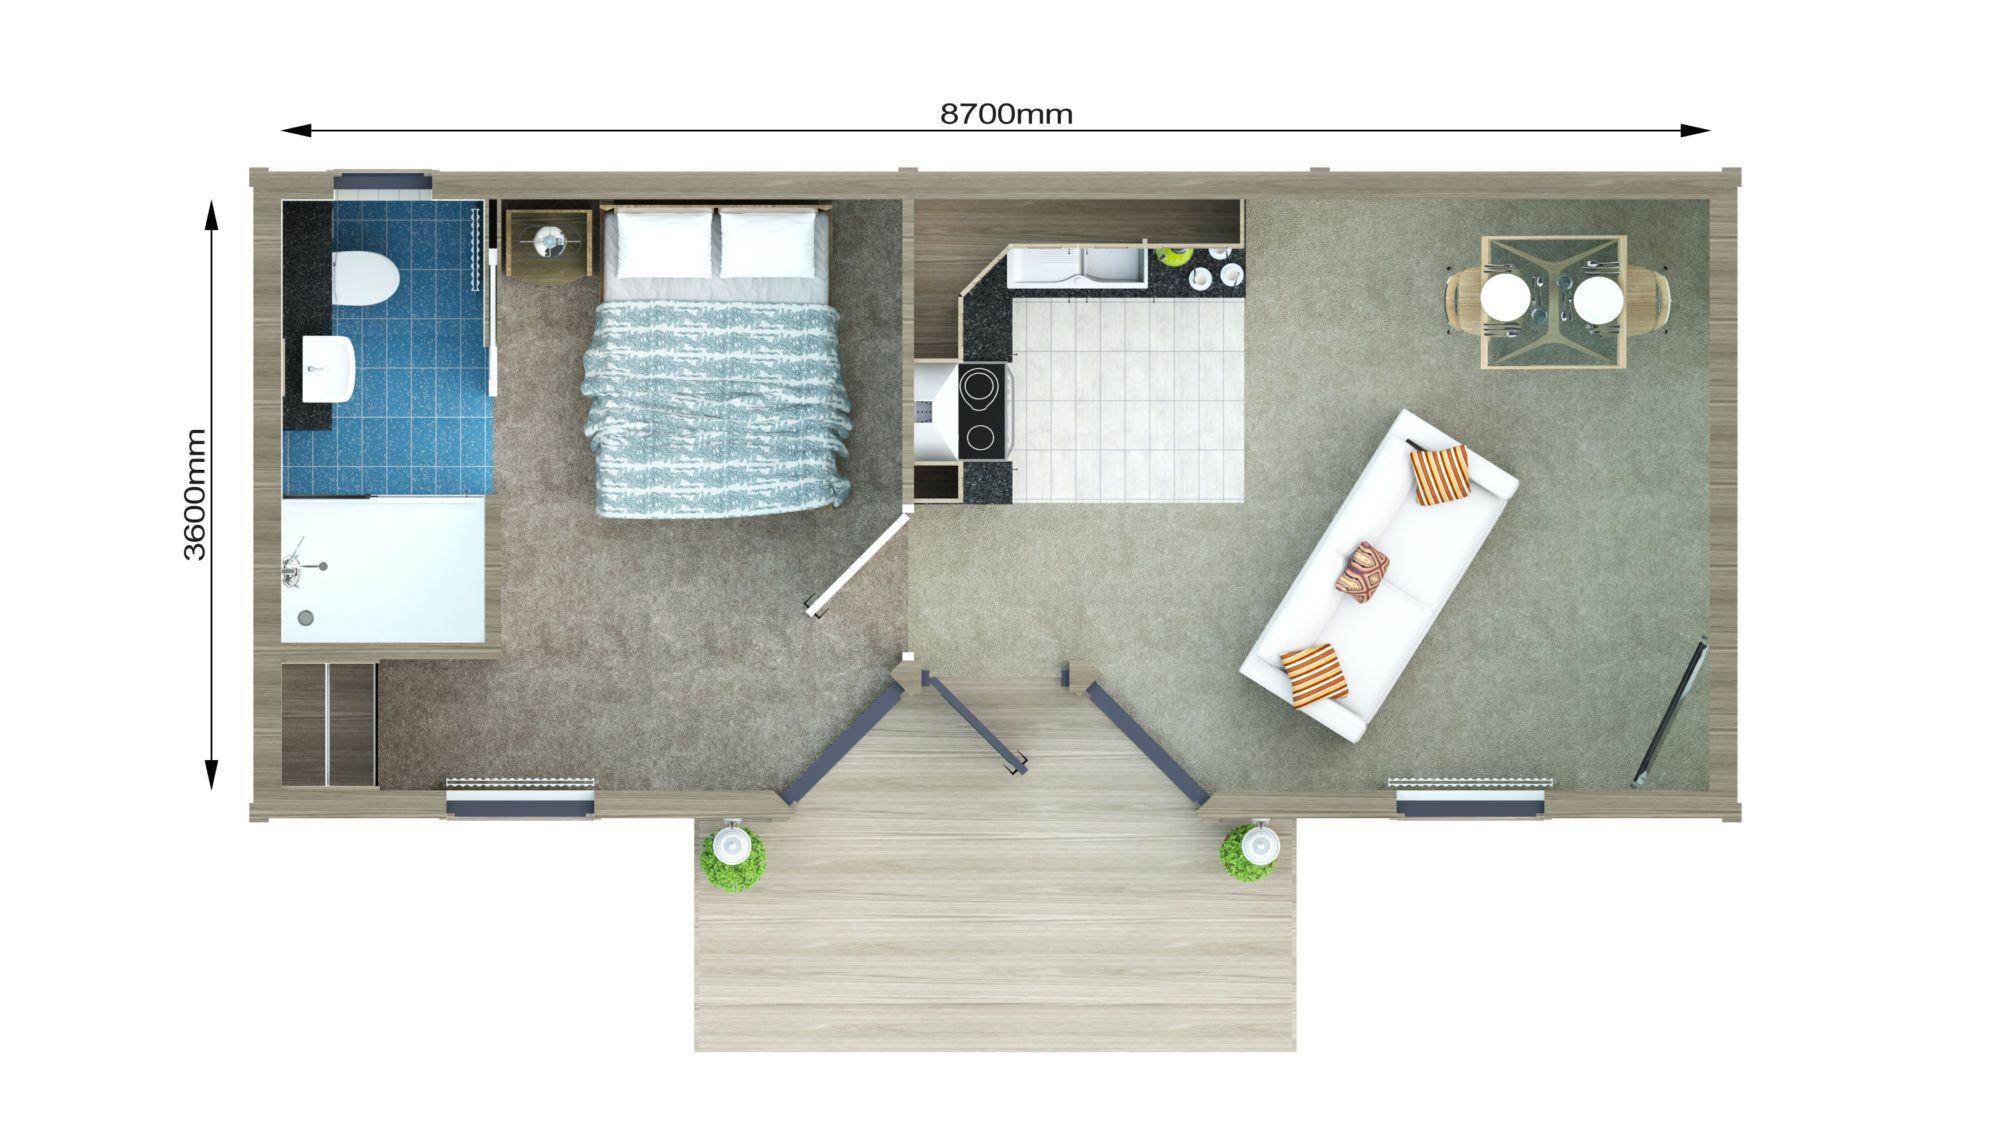 30m2 Cgi 2d Plan Of The Floor Reverend 30m2 Cgi Floor Granny Pods Floor Plans In Laws Plan Reverend Granny Annexe Floor Plans House